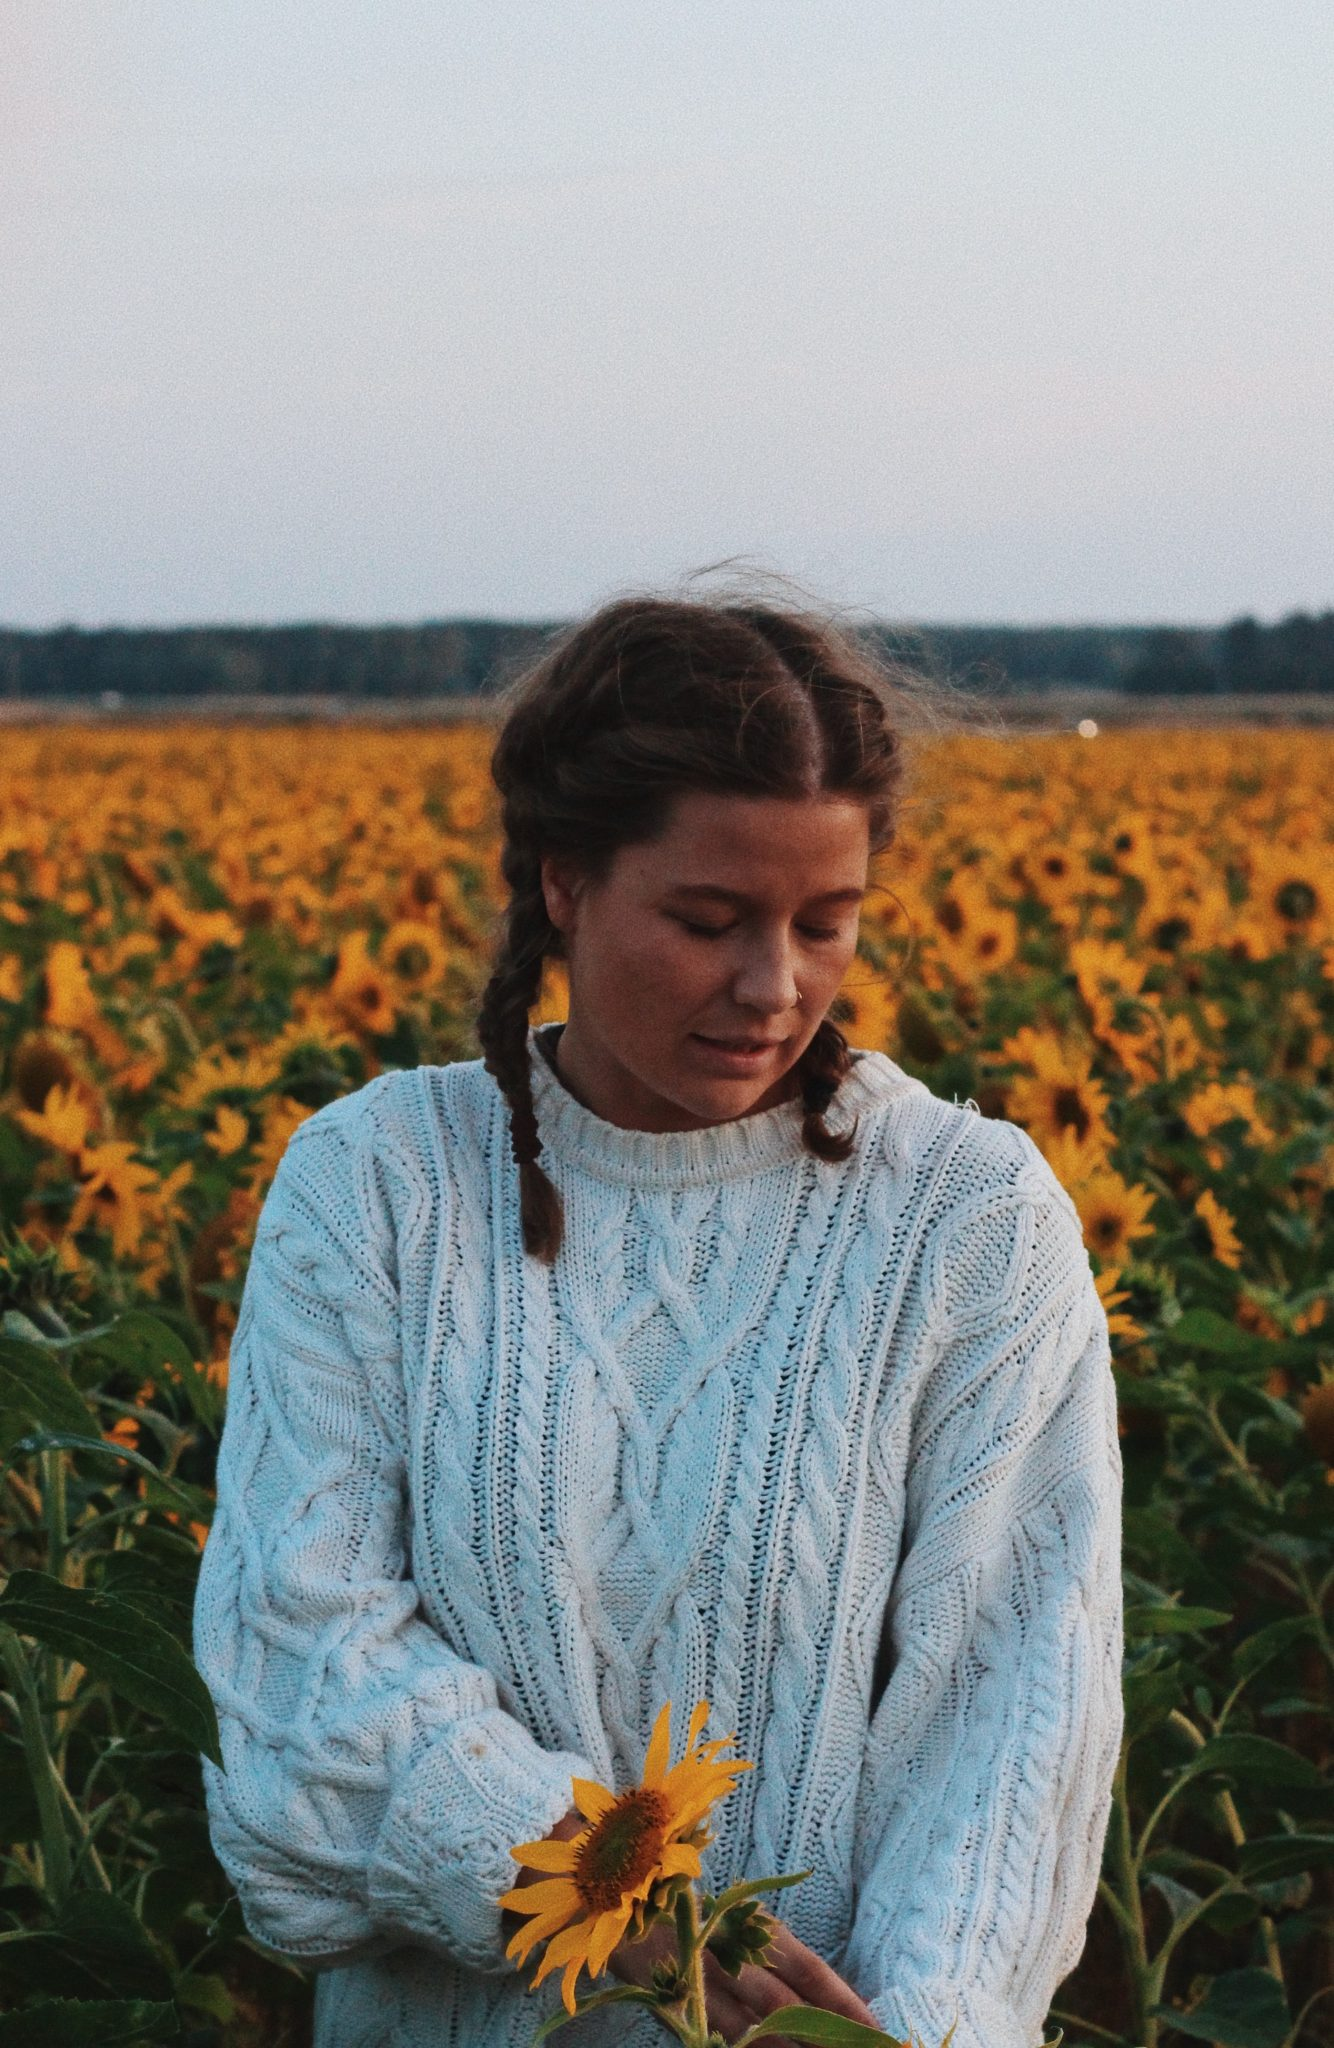 Irene Laitila